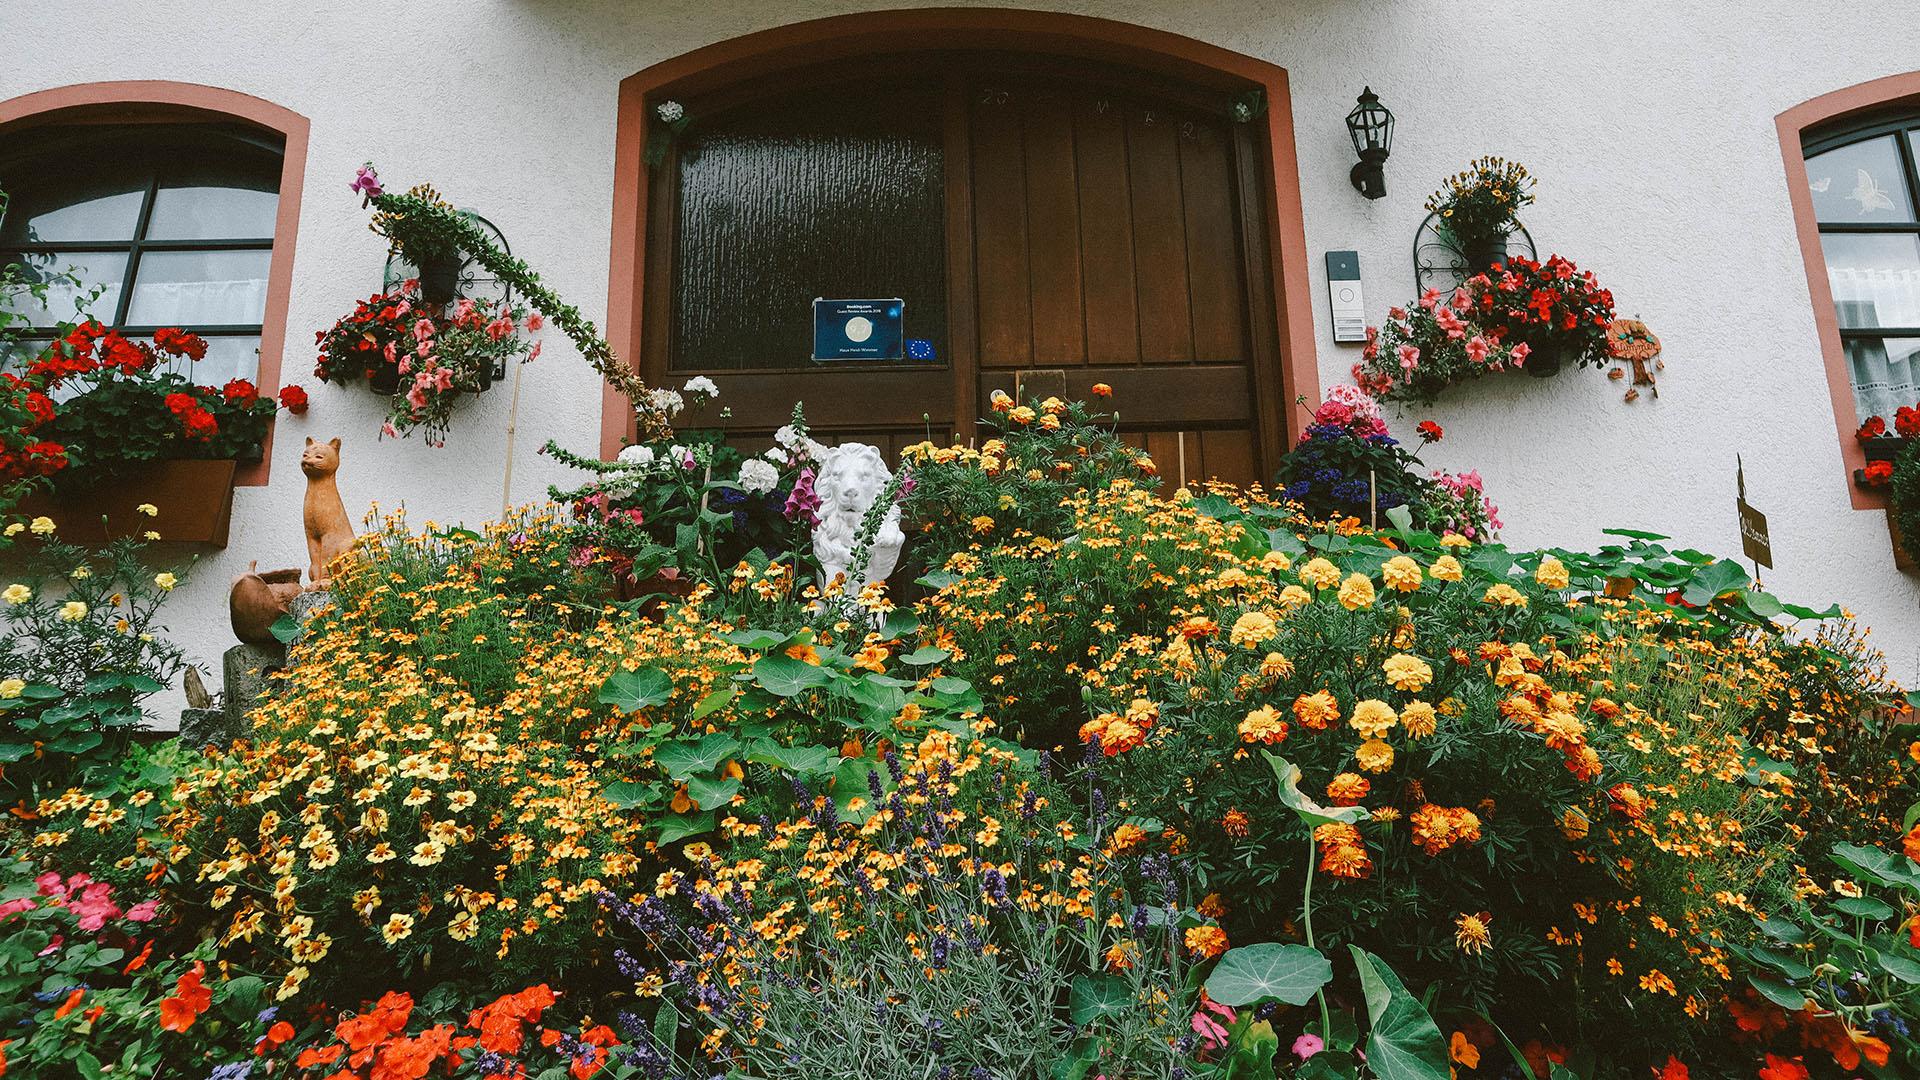 Façade de maison fleurie, Allemagne